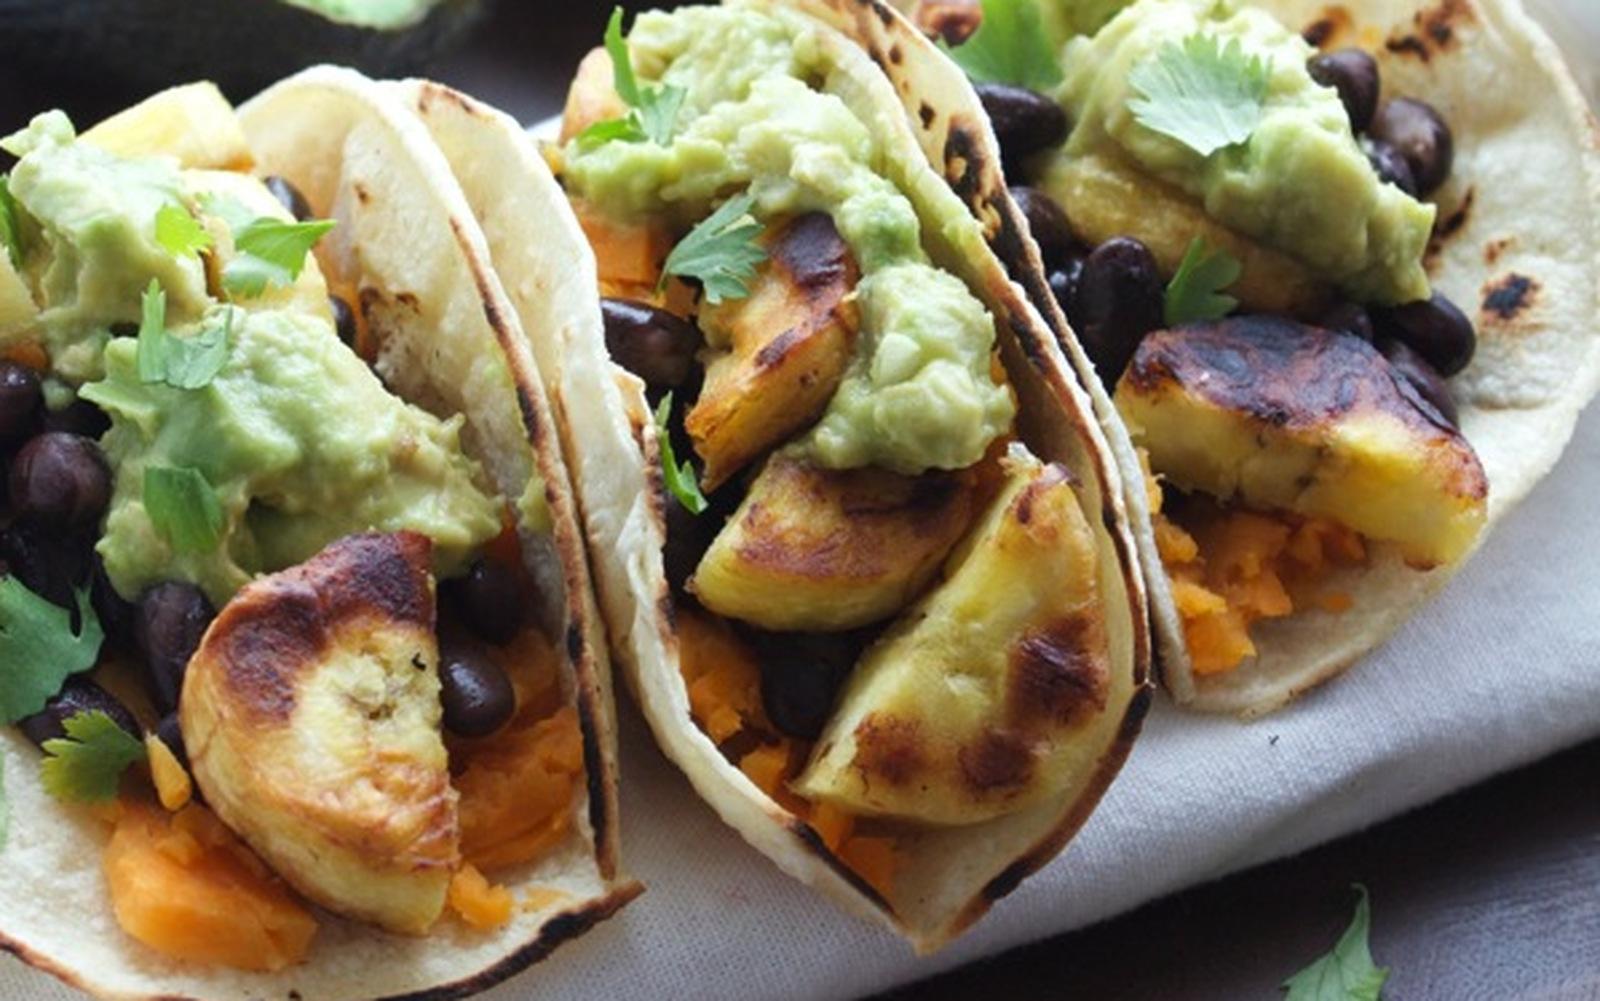 Plantain Sweet Potato Tacos With Guacamole